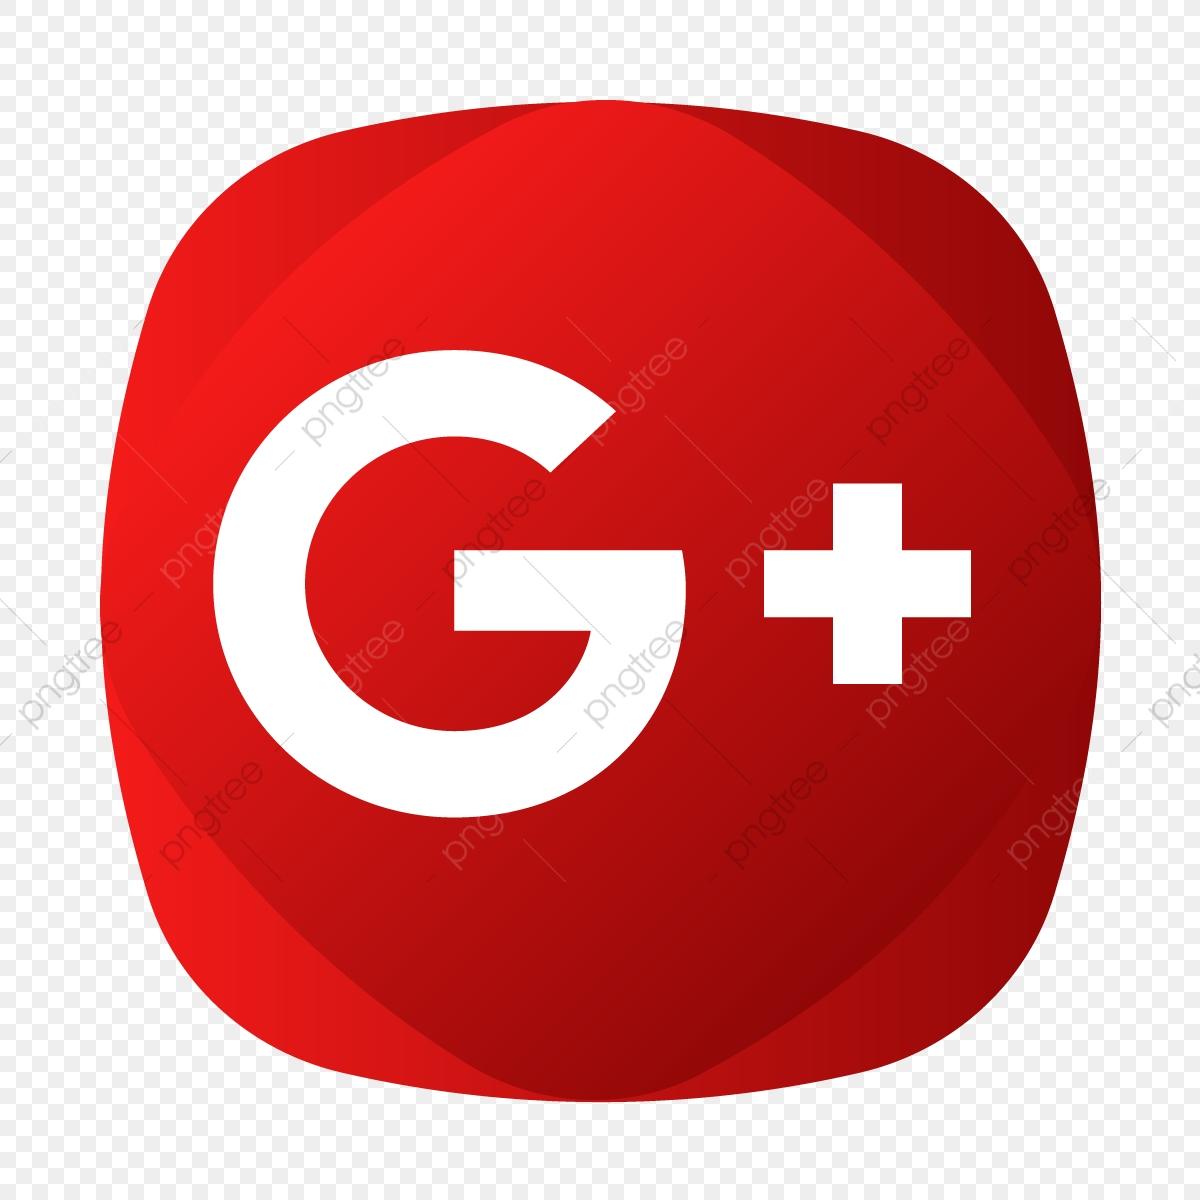 Google Plus Creative Icon, Google Plus, Google Plus Icon, Google.